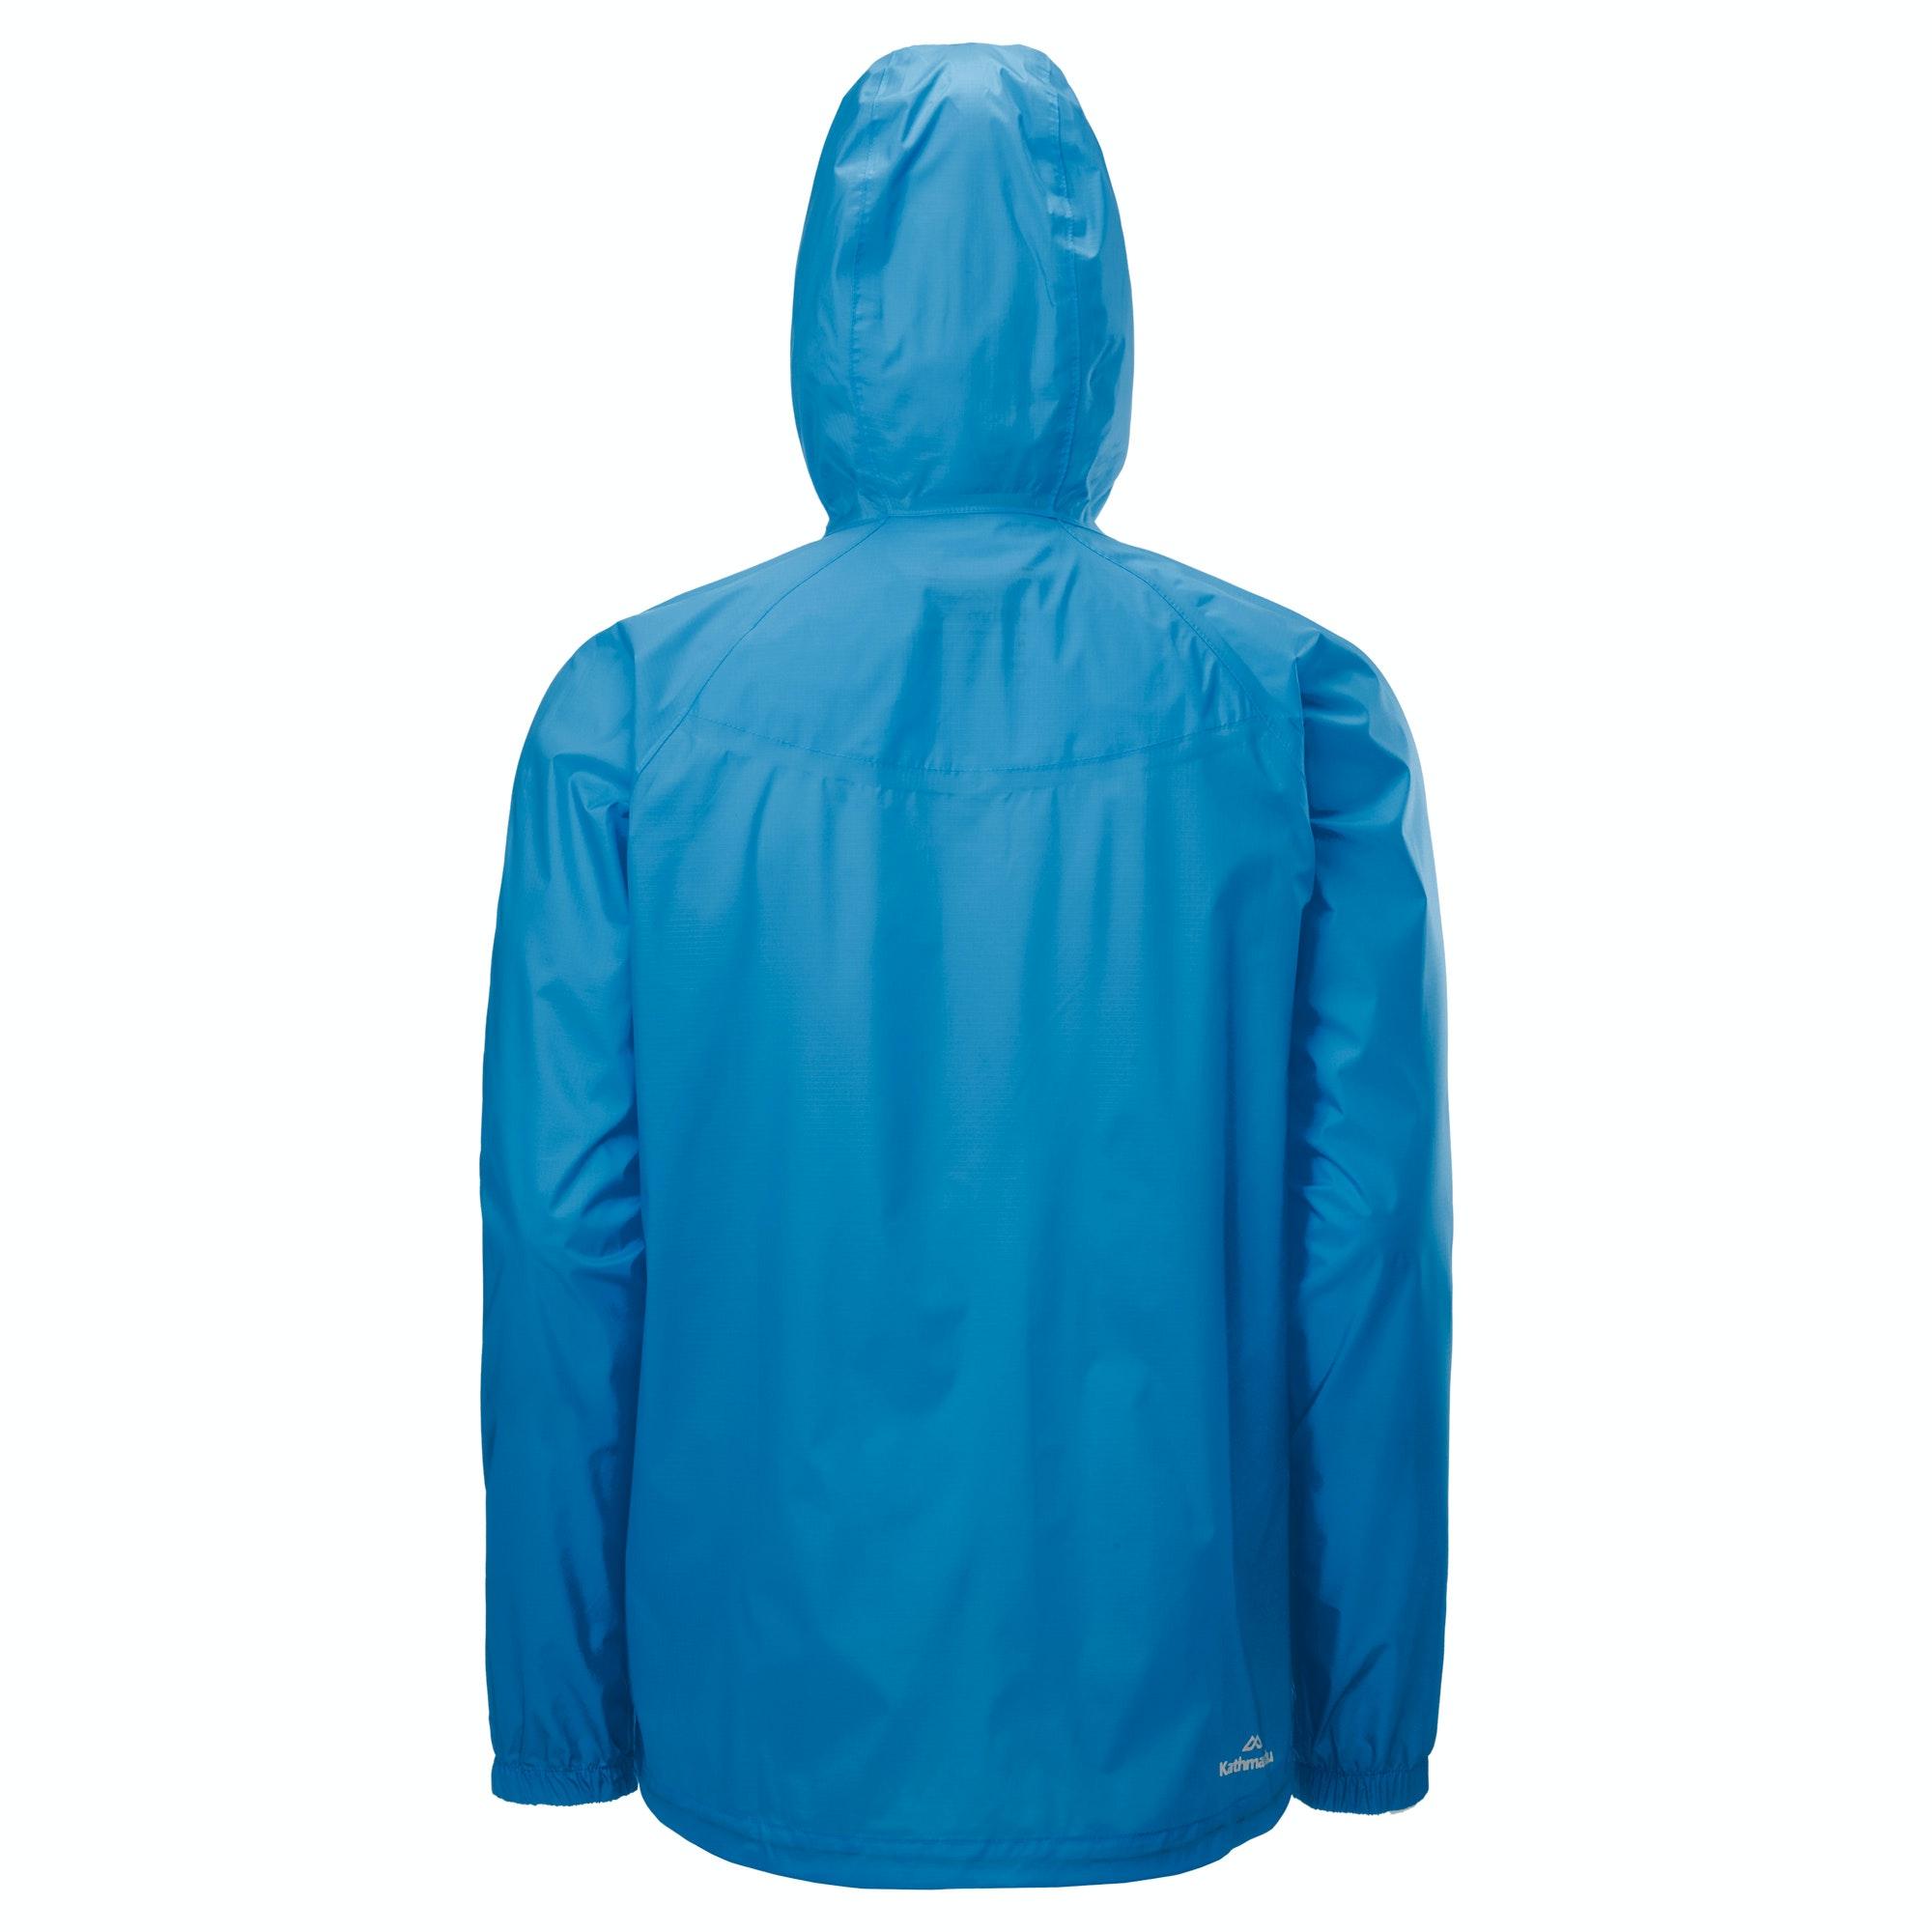 Teal Rain Jacket Jackets Review